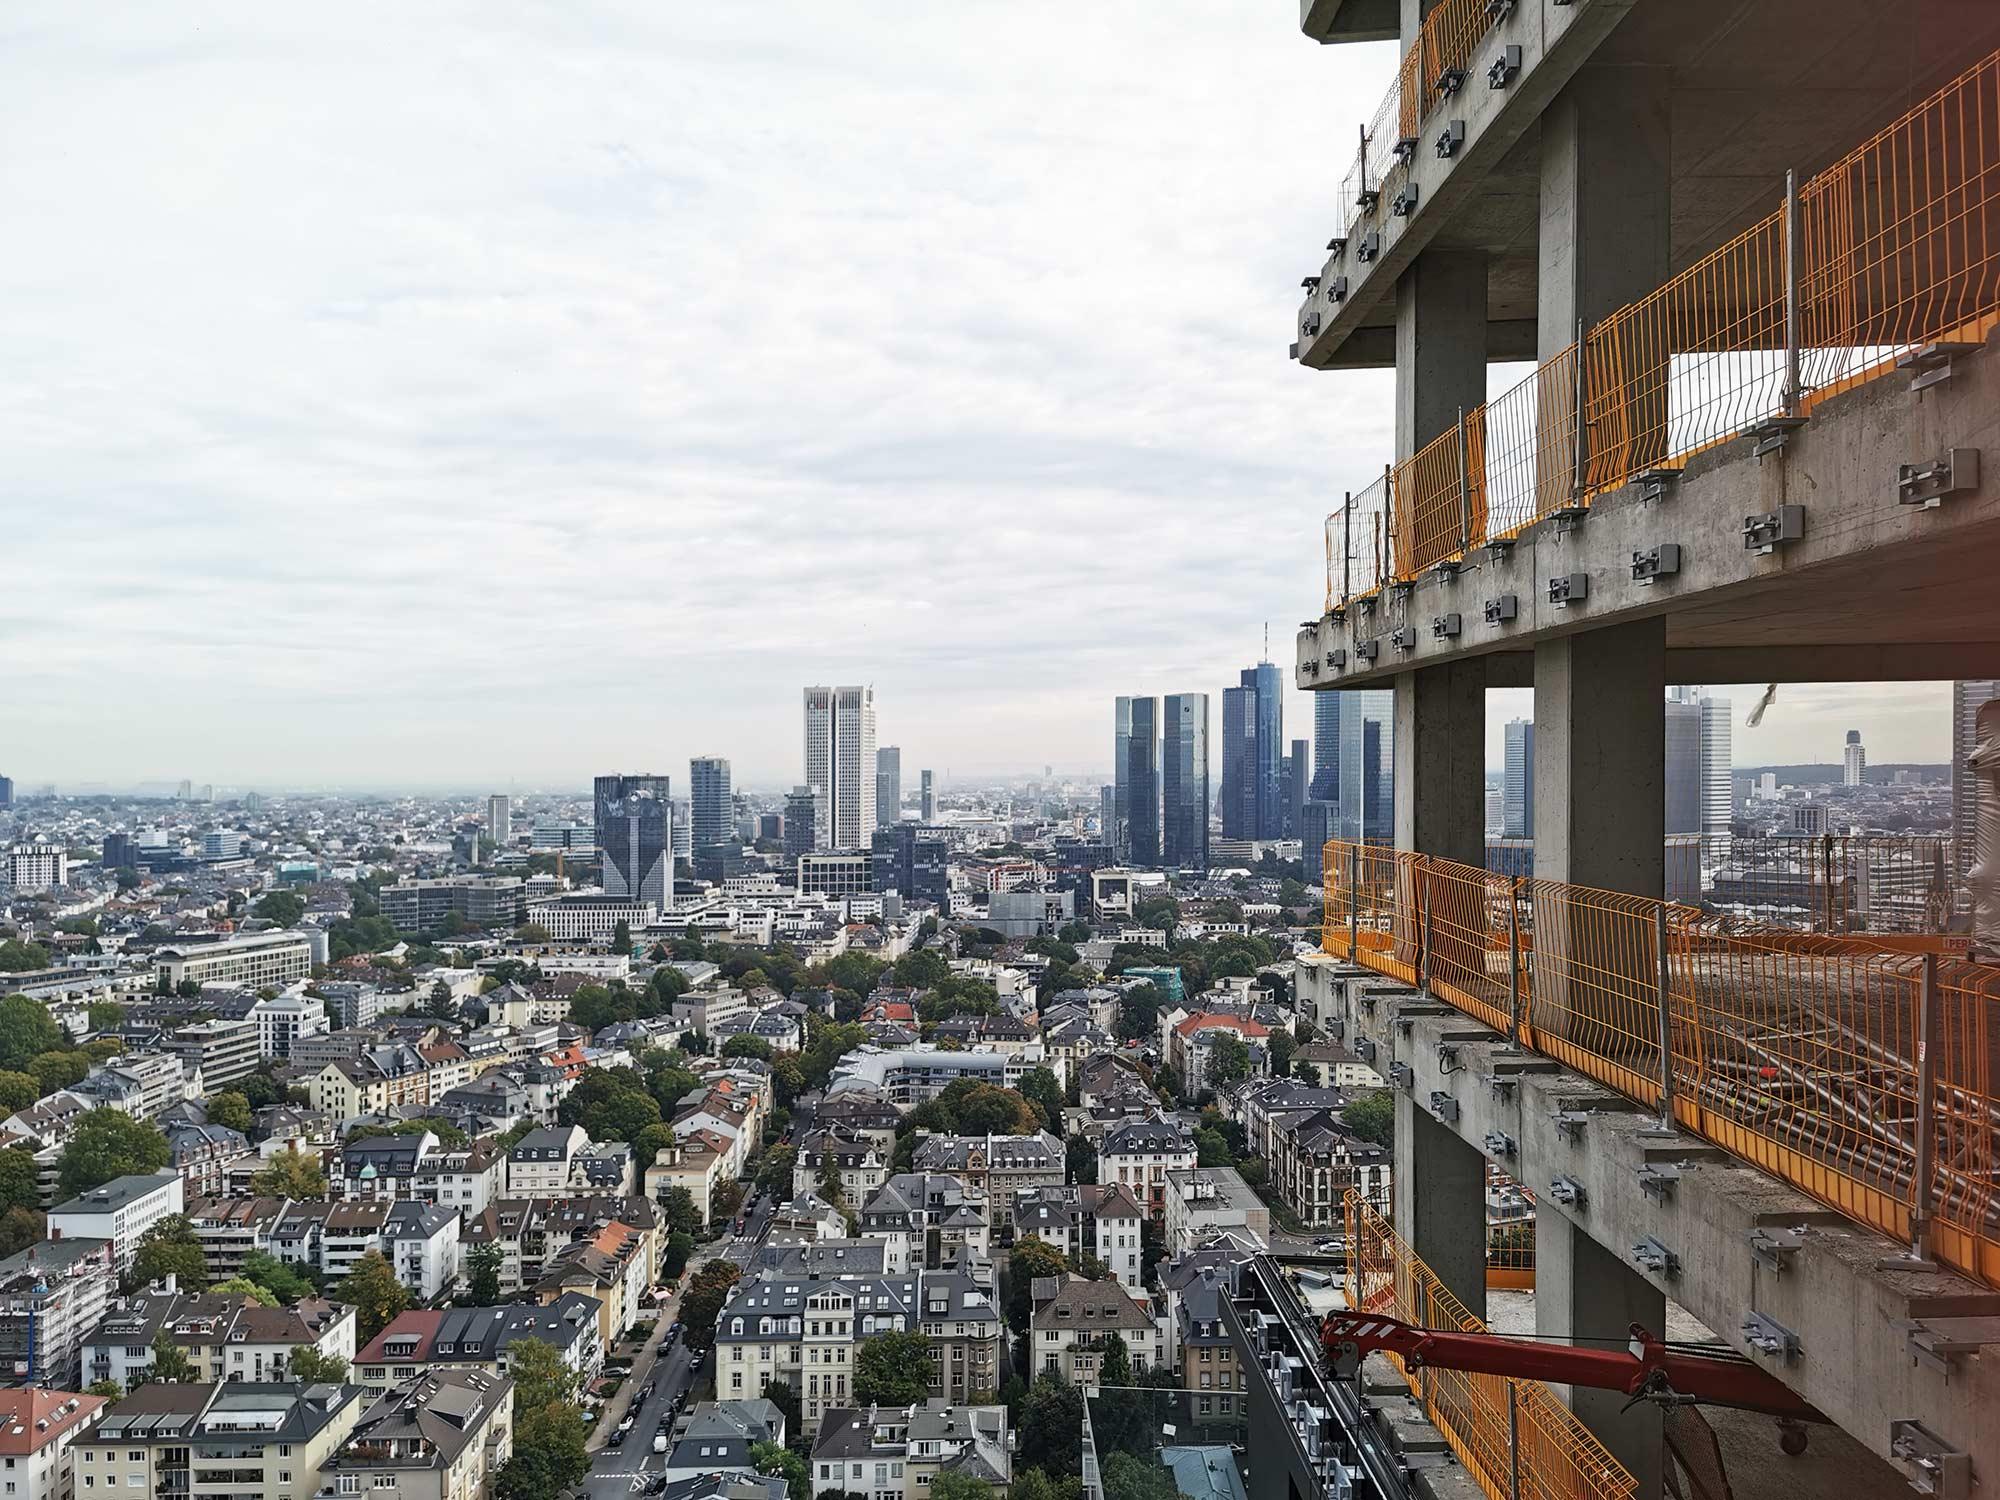 ONE FORTY WEST - Hochhausbaustelle - Skylineblick Frankfurt - Hochhausturm im Bau